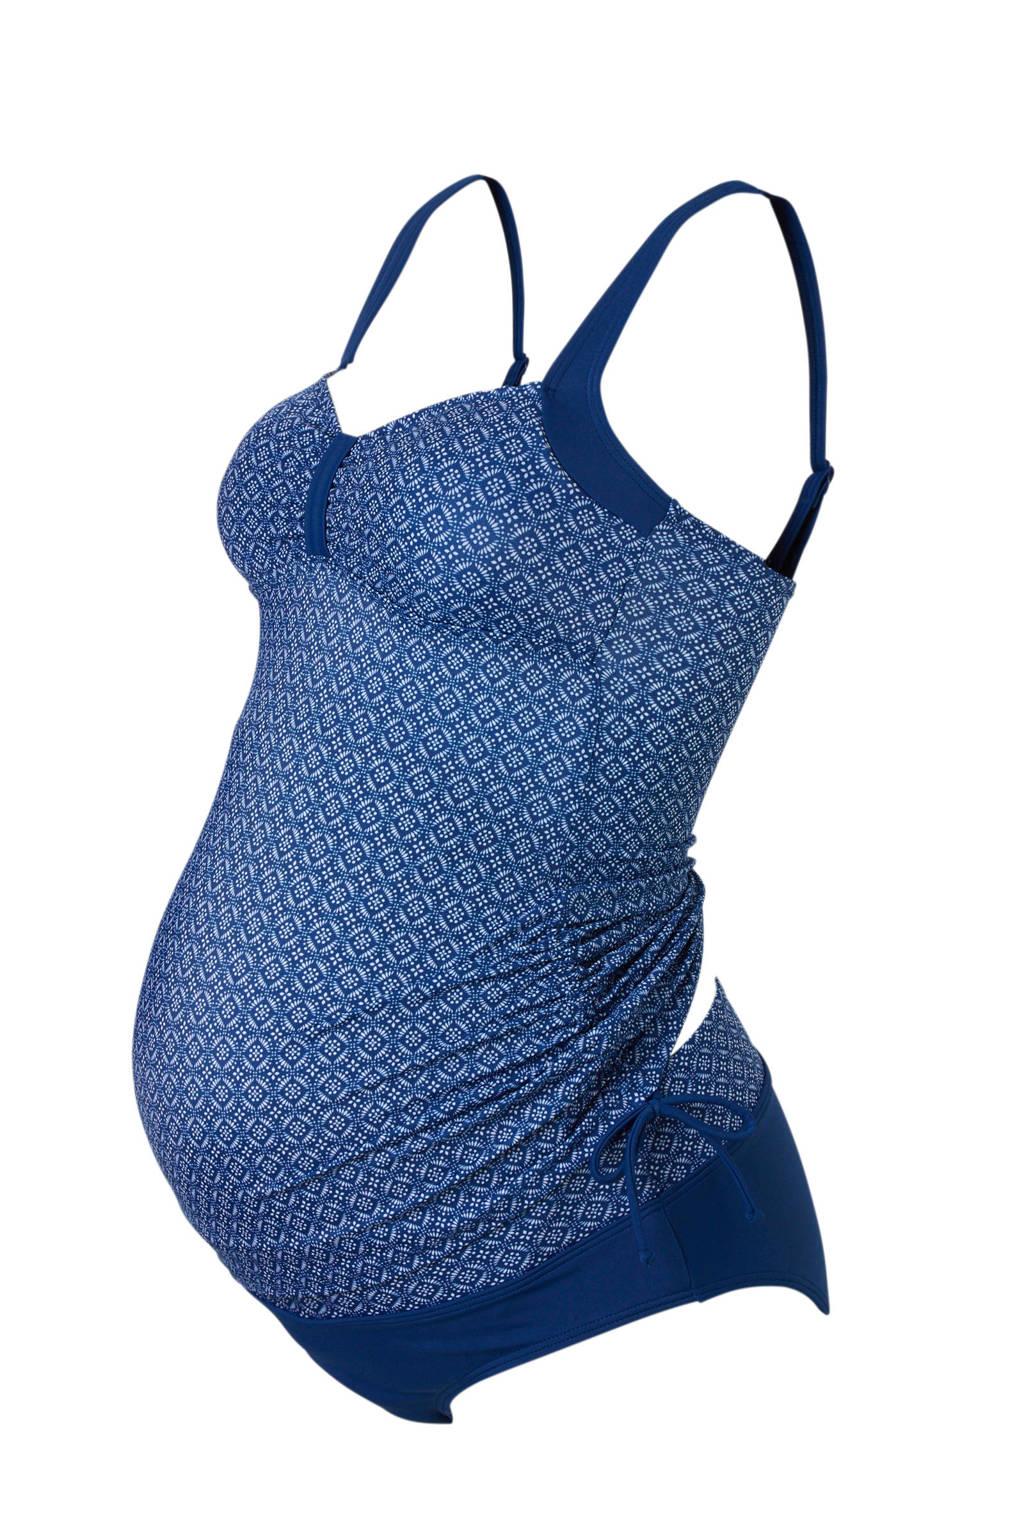 C&A Positiemode zwangerschaps tankini blauw, Blauw/wit